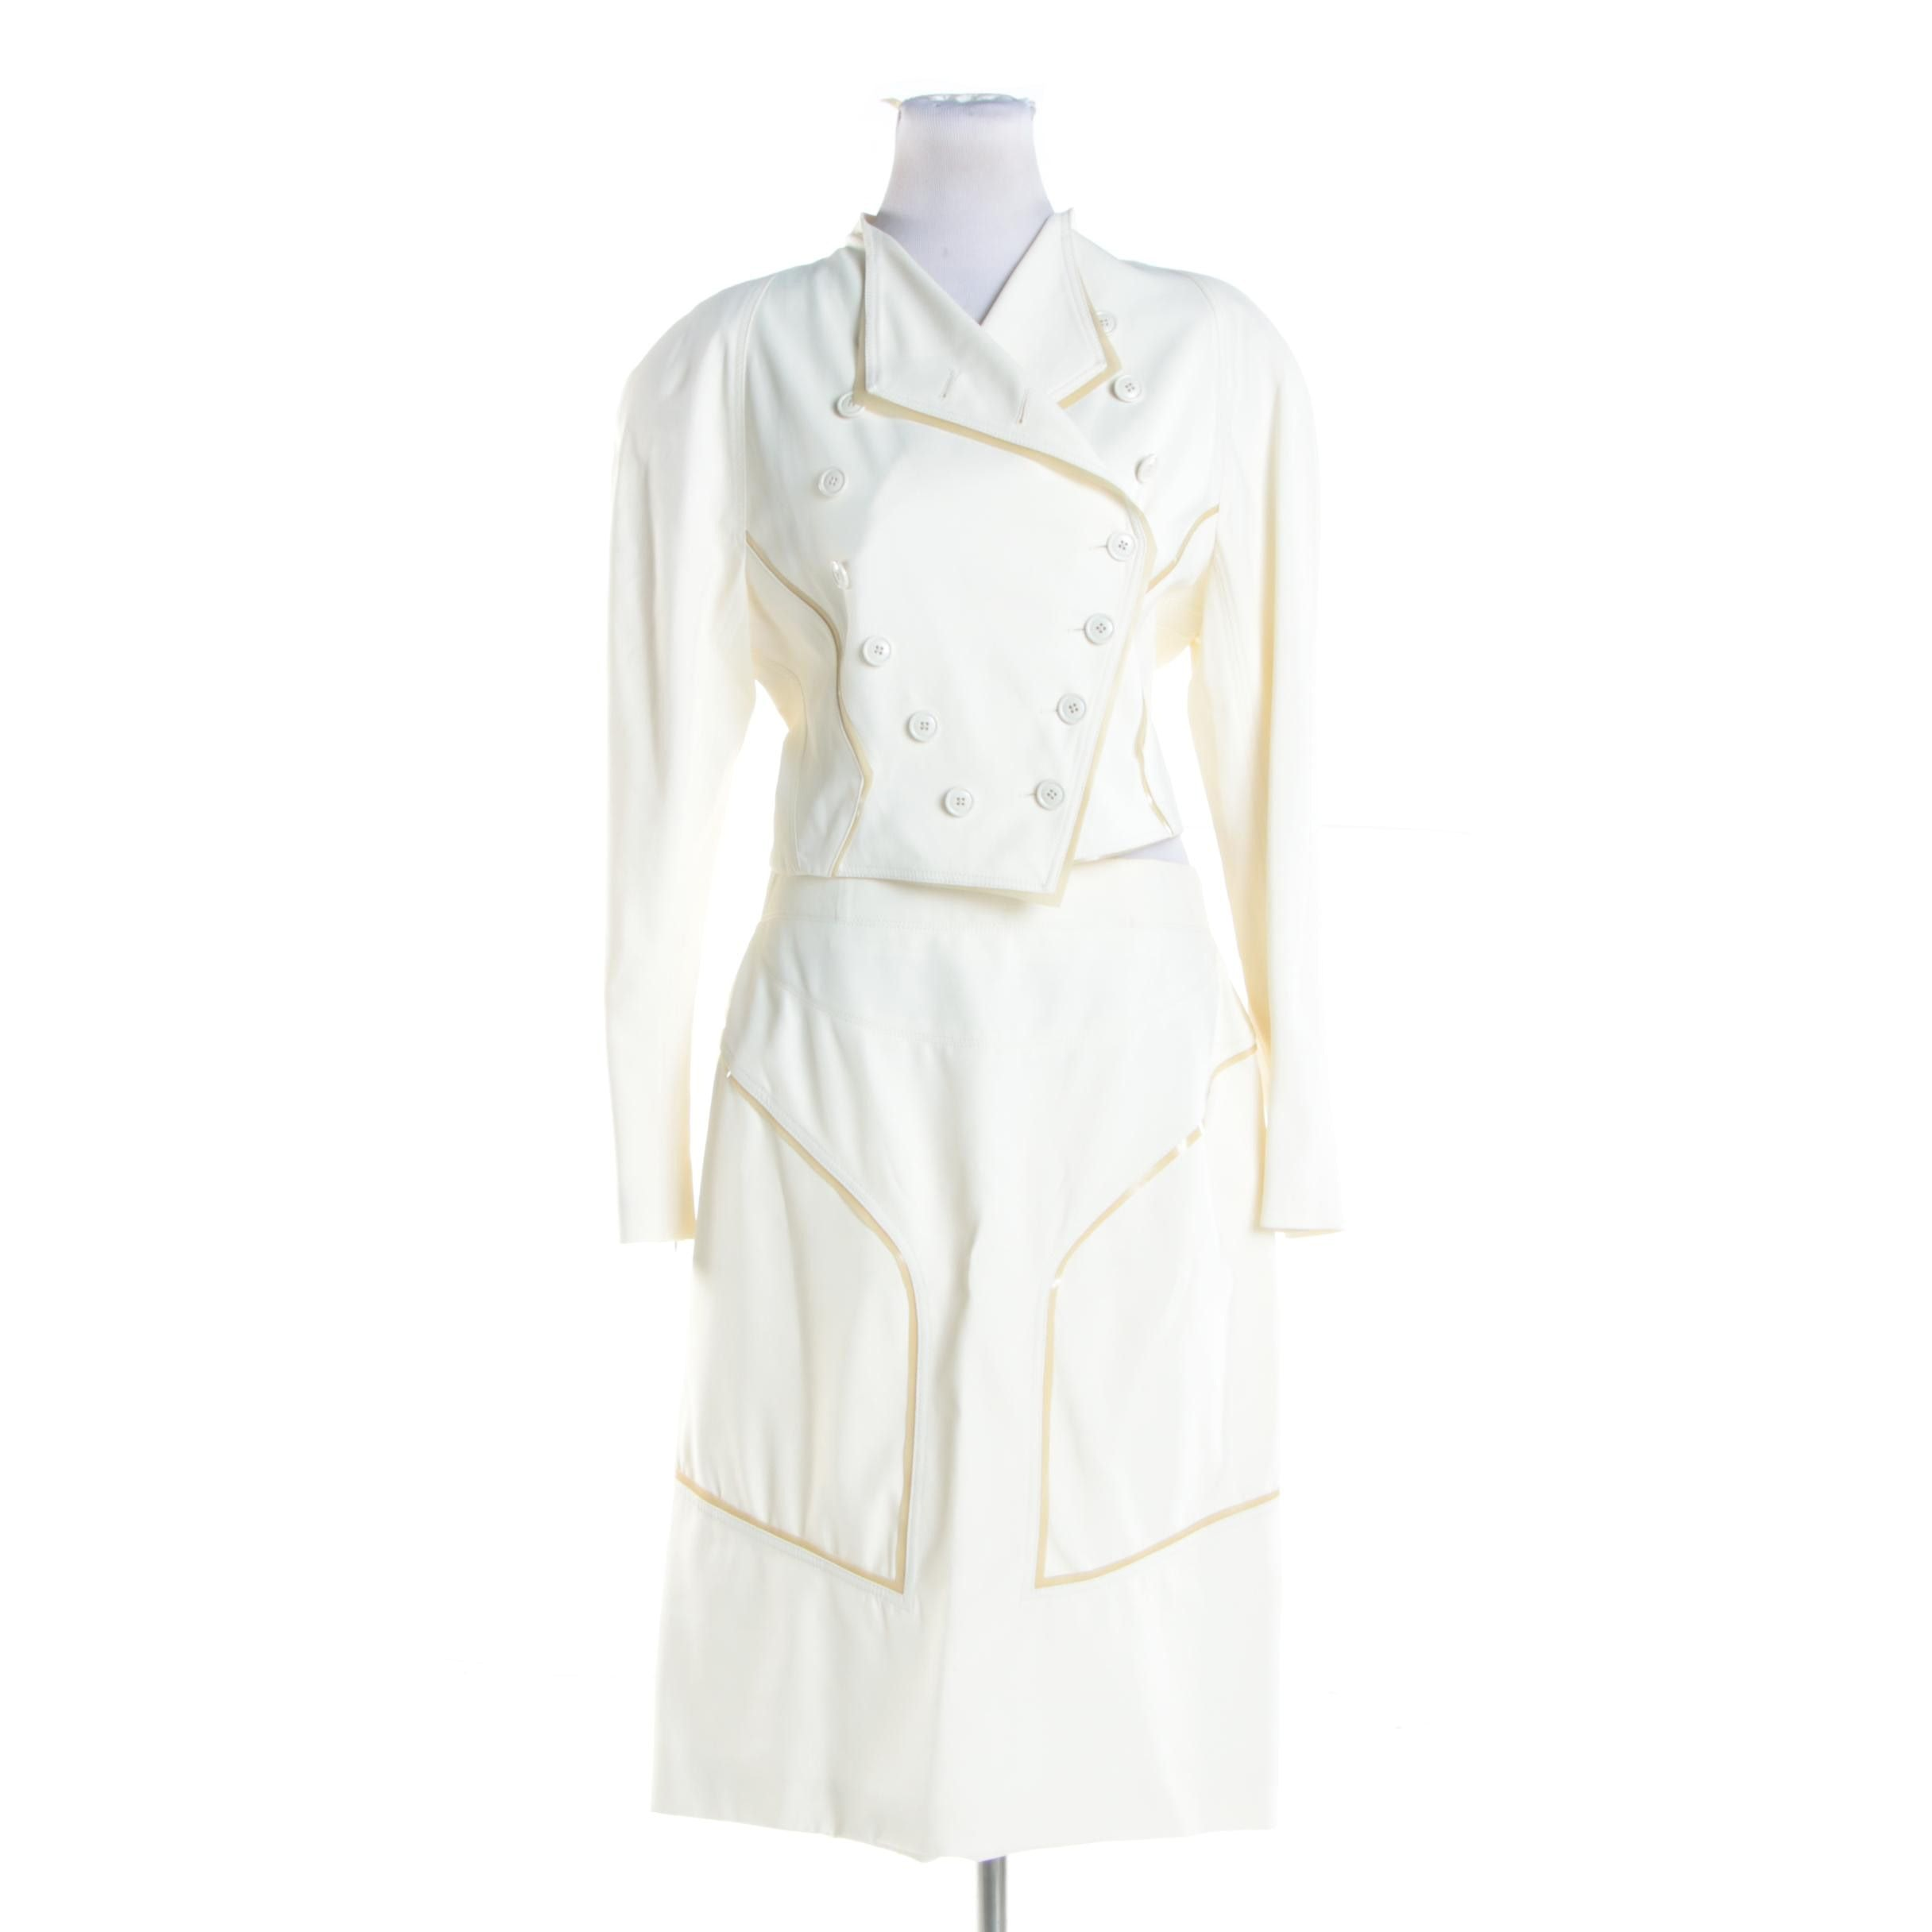 Late 1990s Balenciaga of Paris Structured Cream Skirt Suit